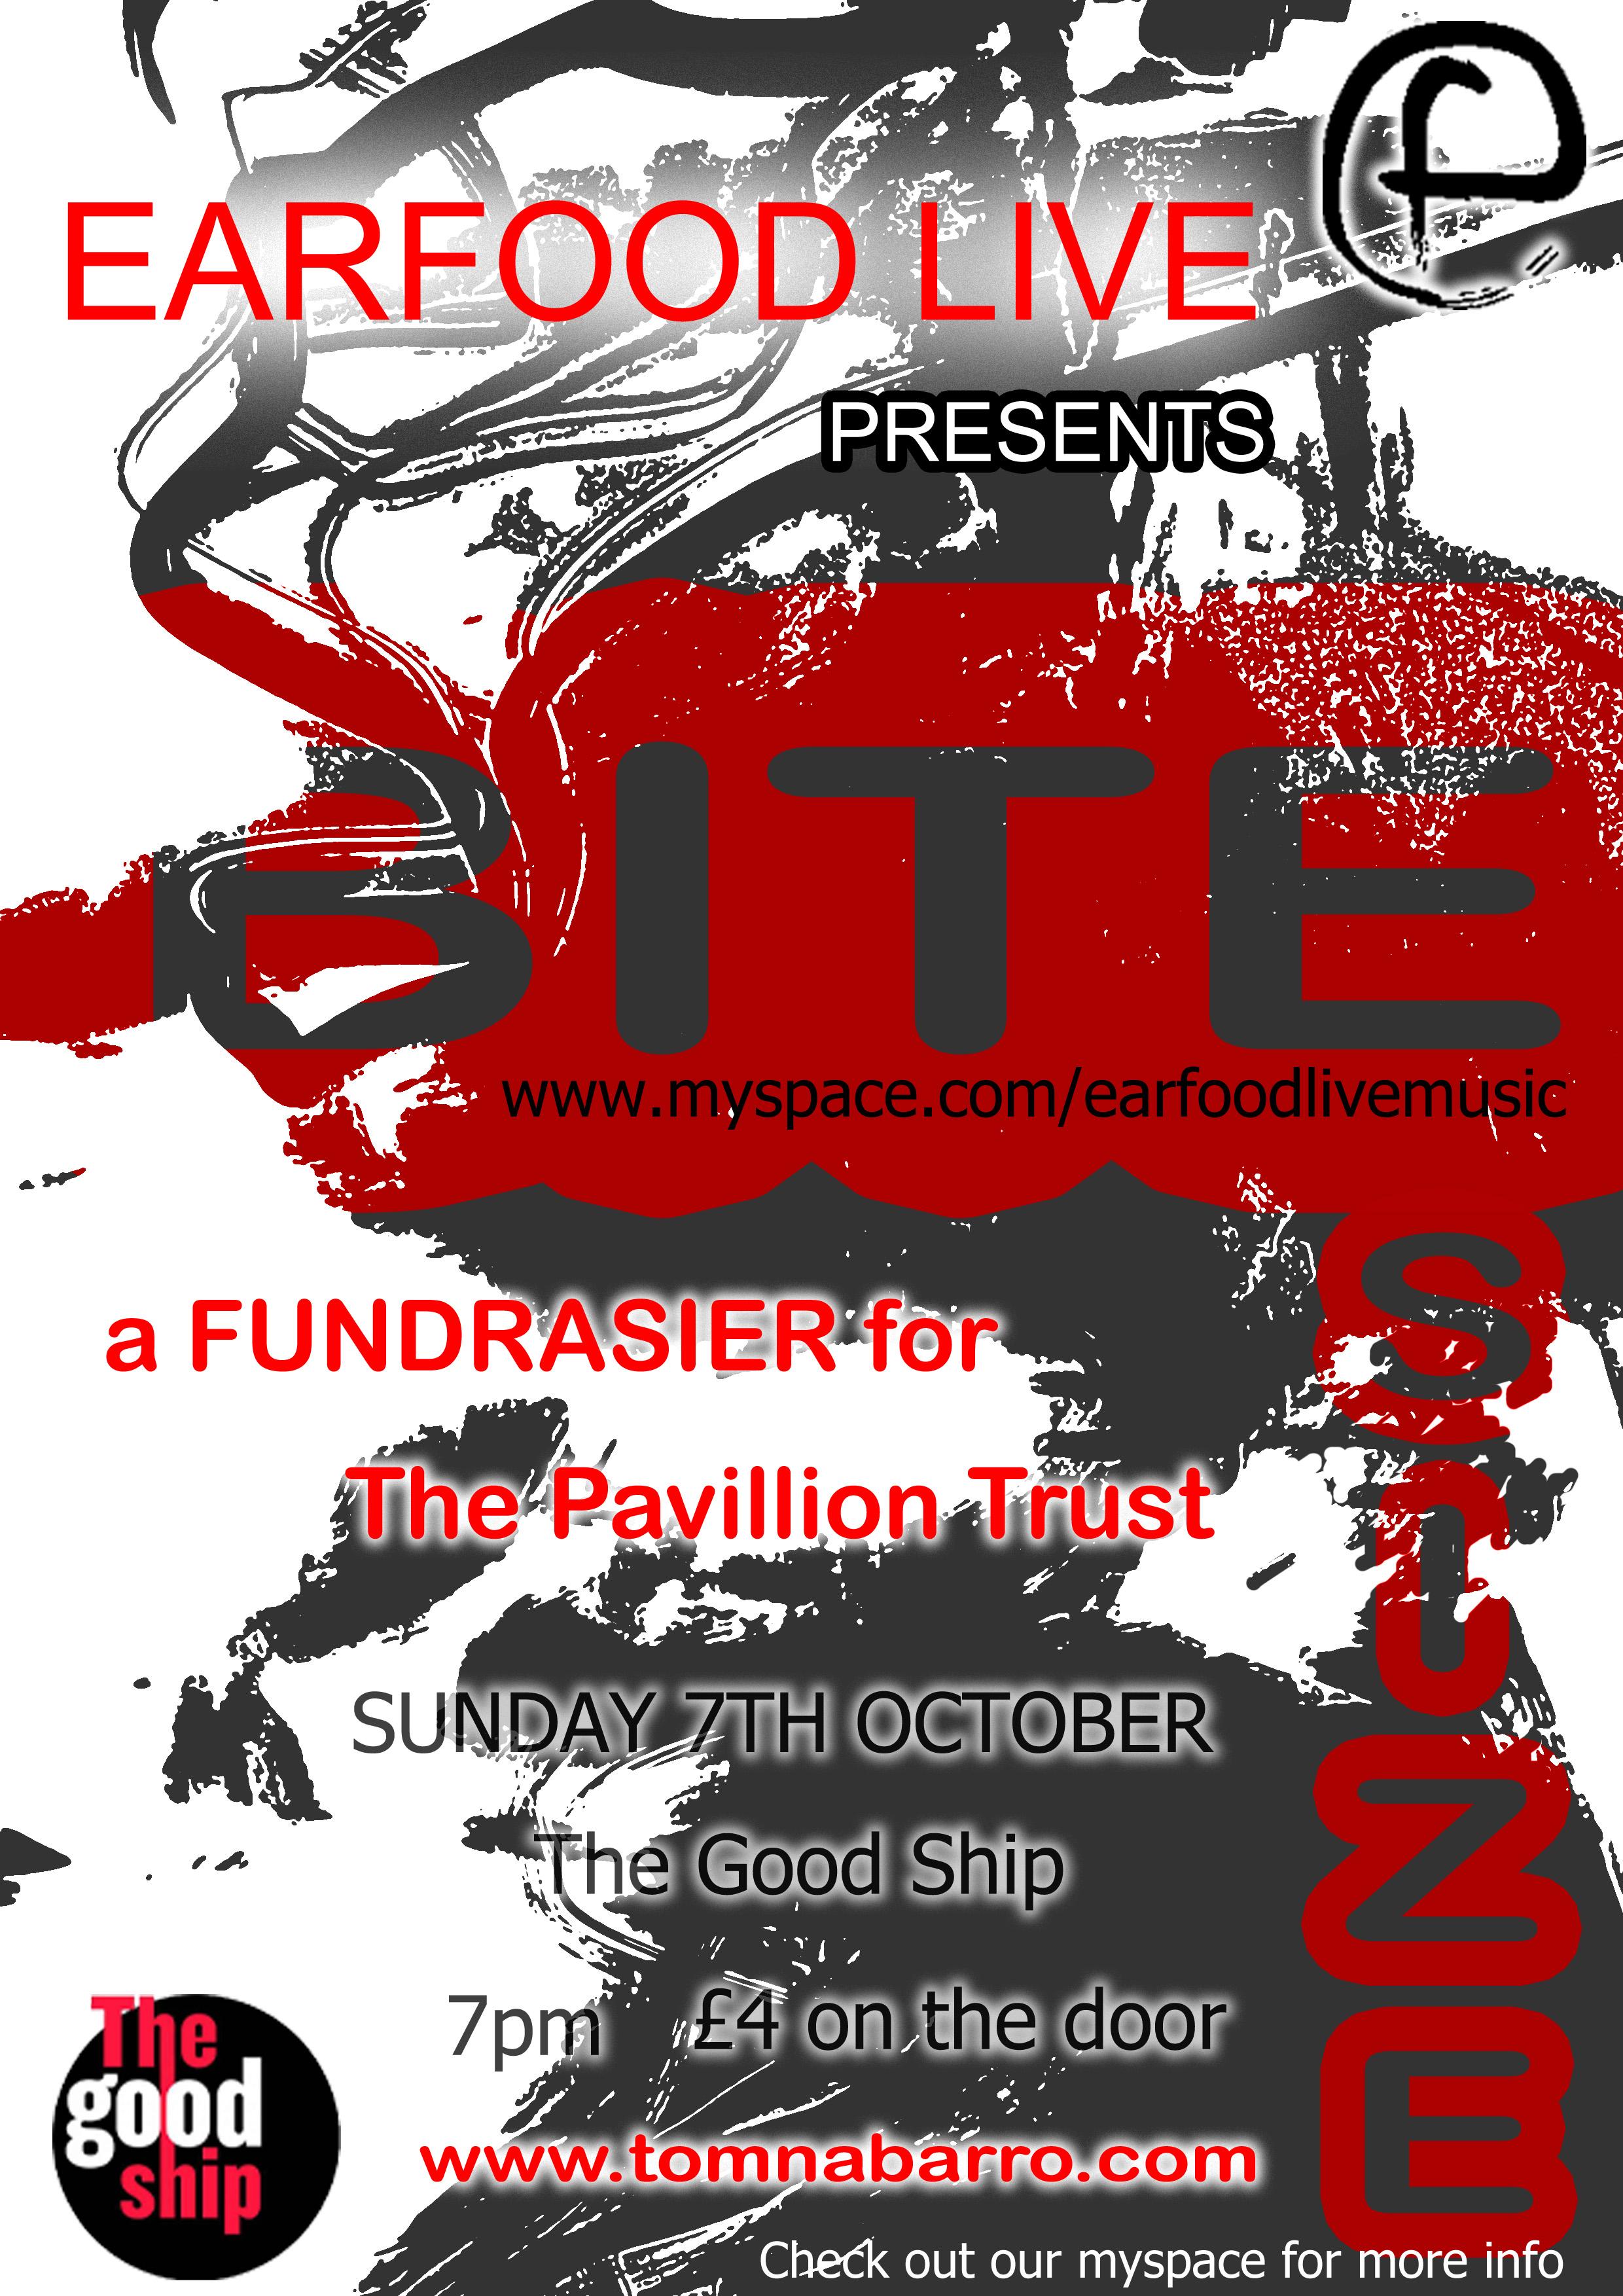 Erin's fundraiser